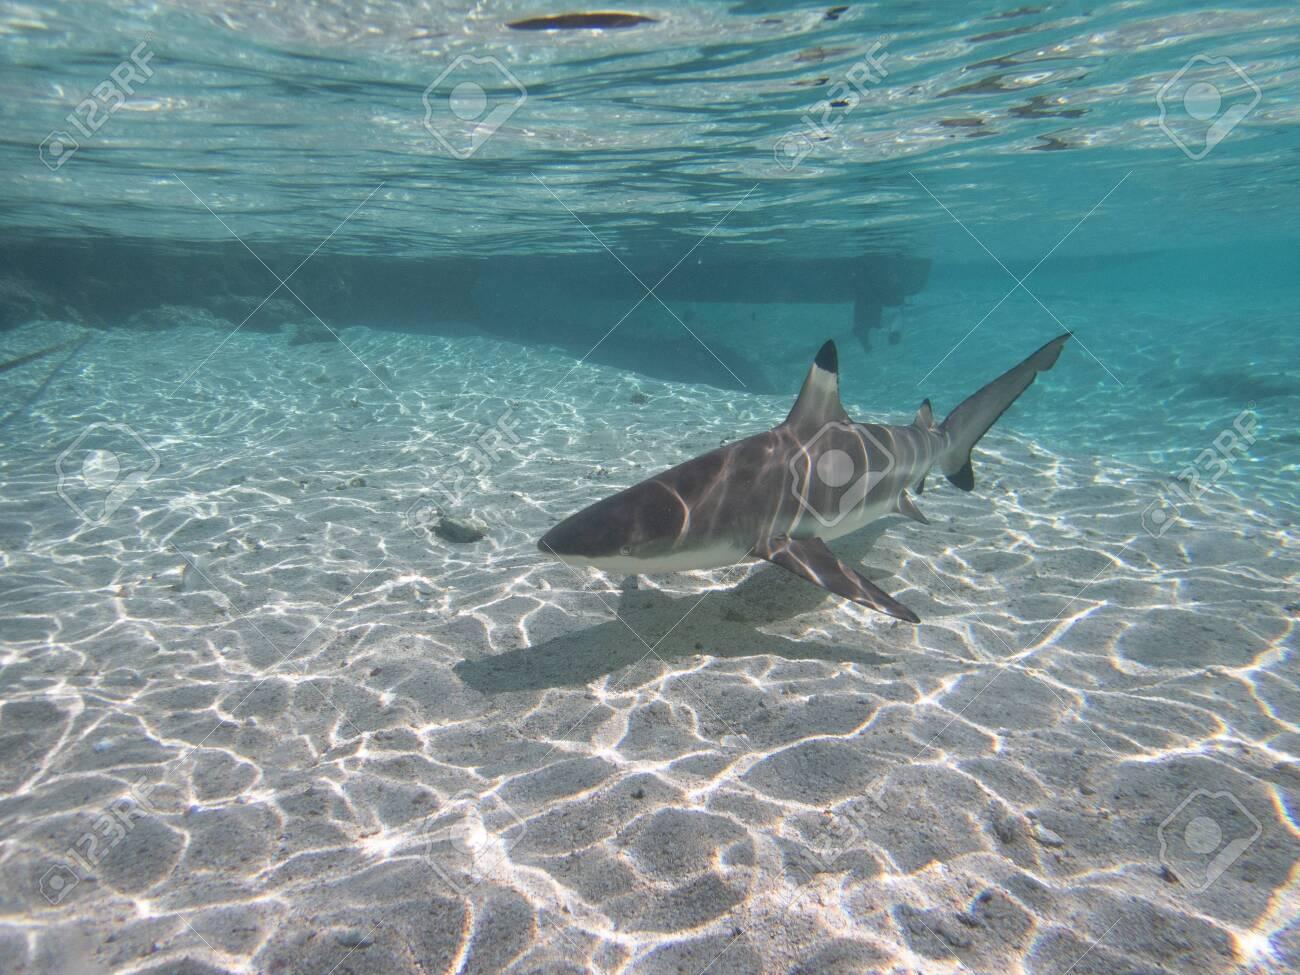 Blacktip Reef Shark in the lagoon off Moorea, French Polynesia next to Tahiti - 156618513